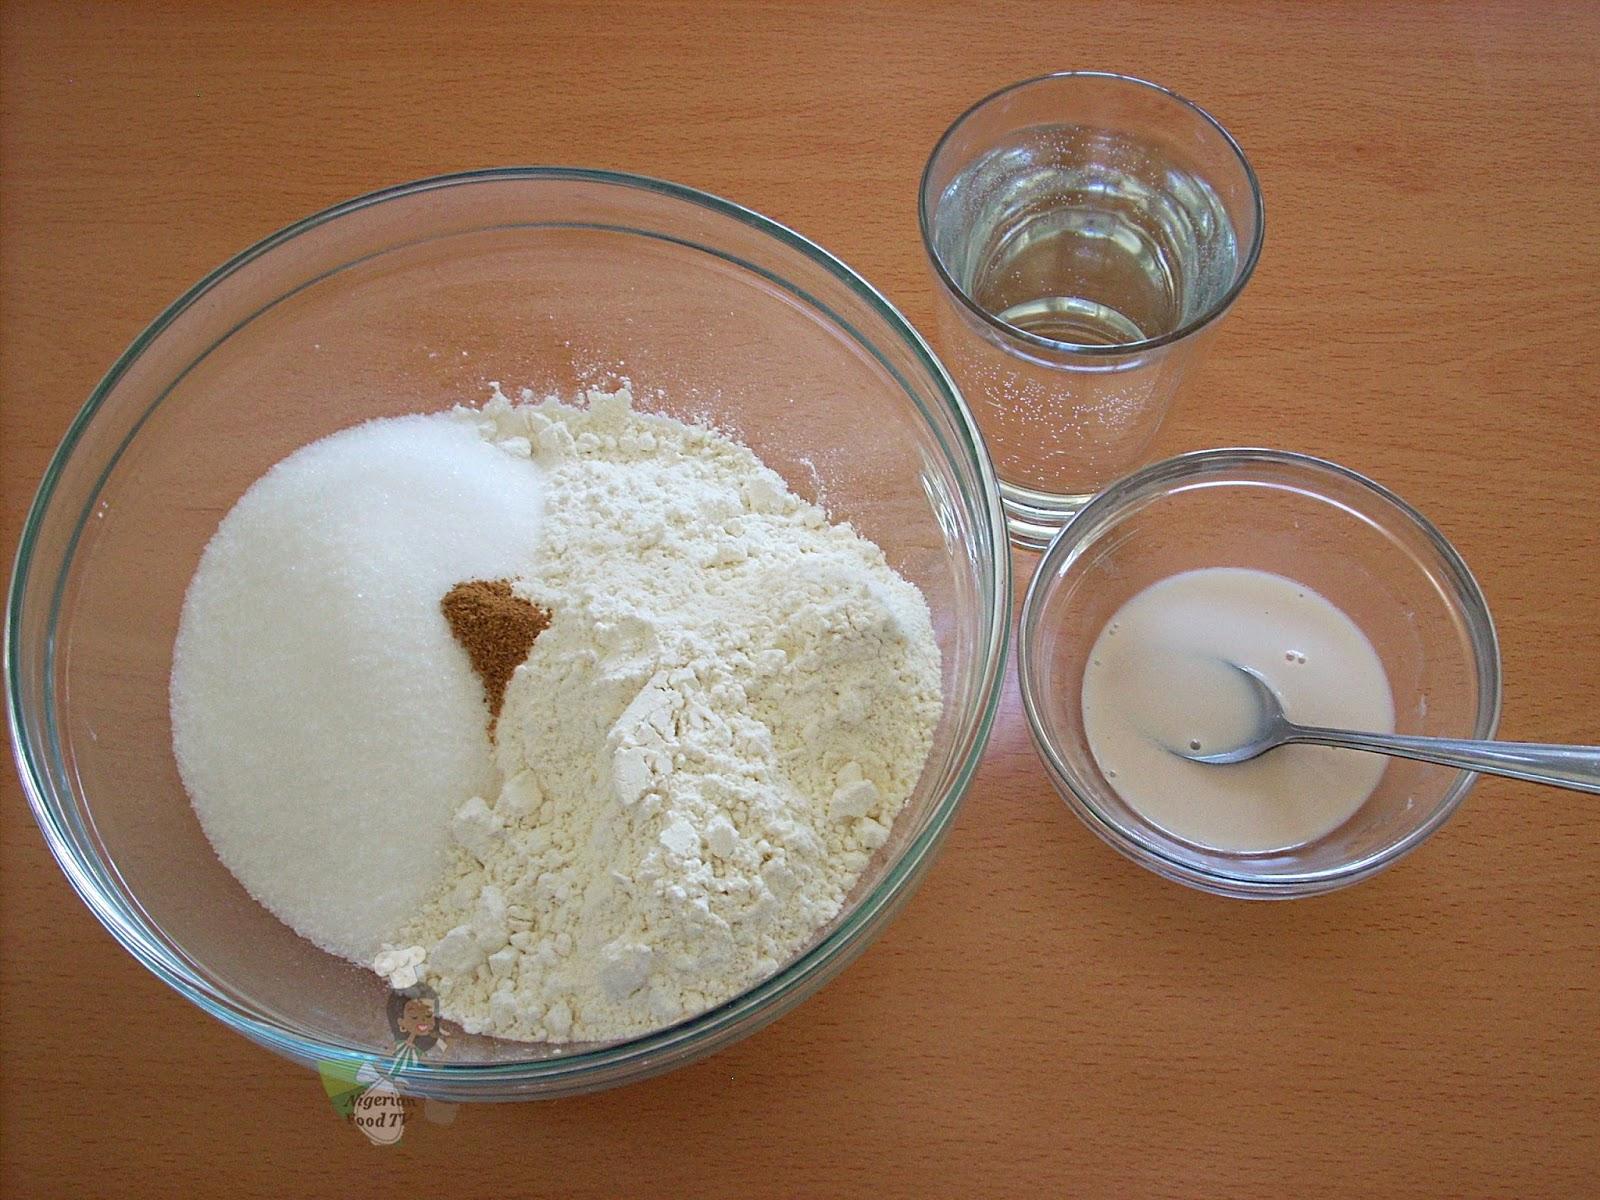 puff puff ingredients